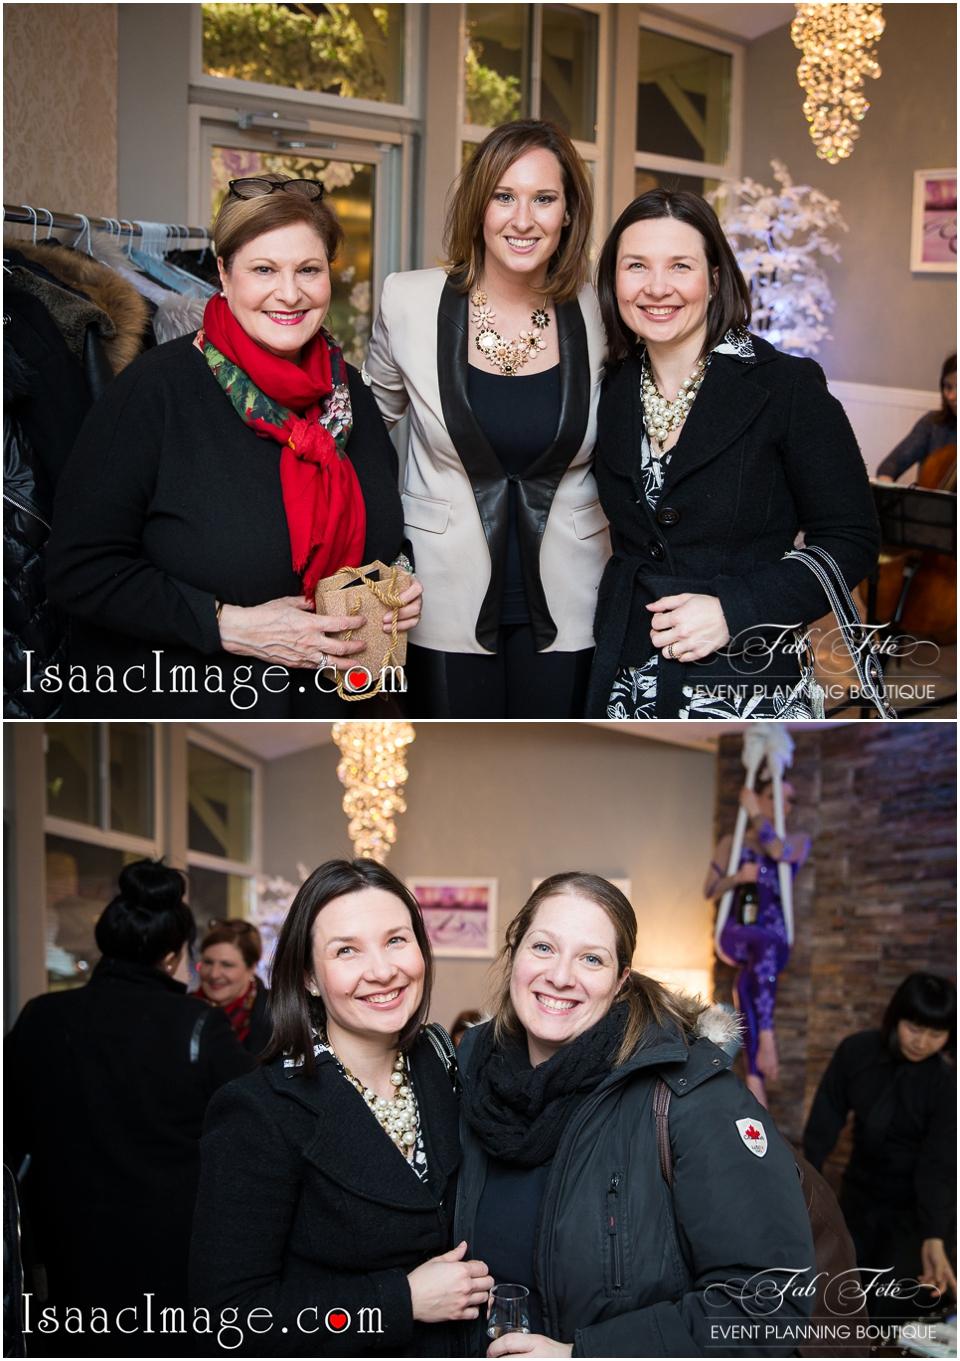 Fab Fete Toronto Wedding Event Planning Boutique open house_6476.jpg